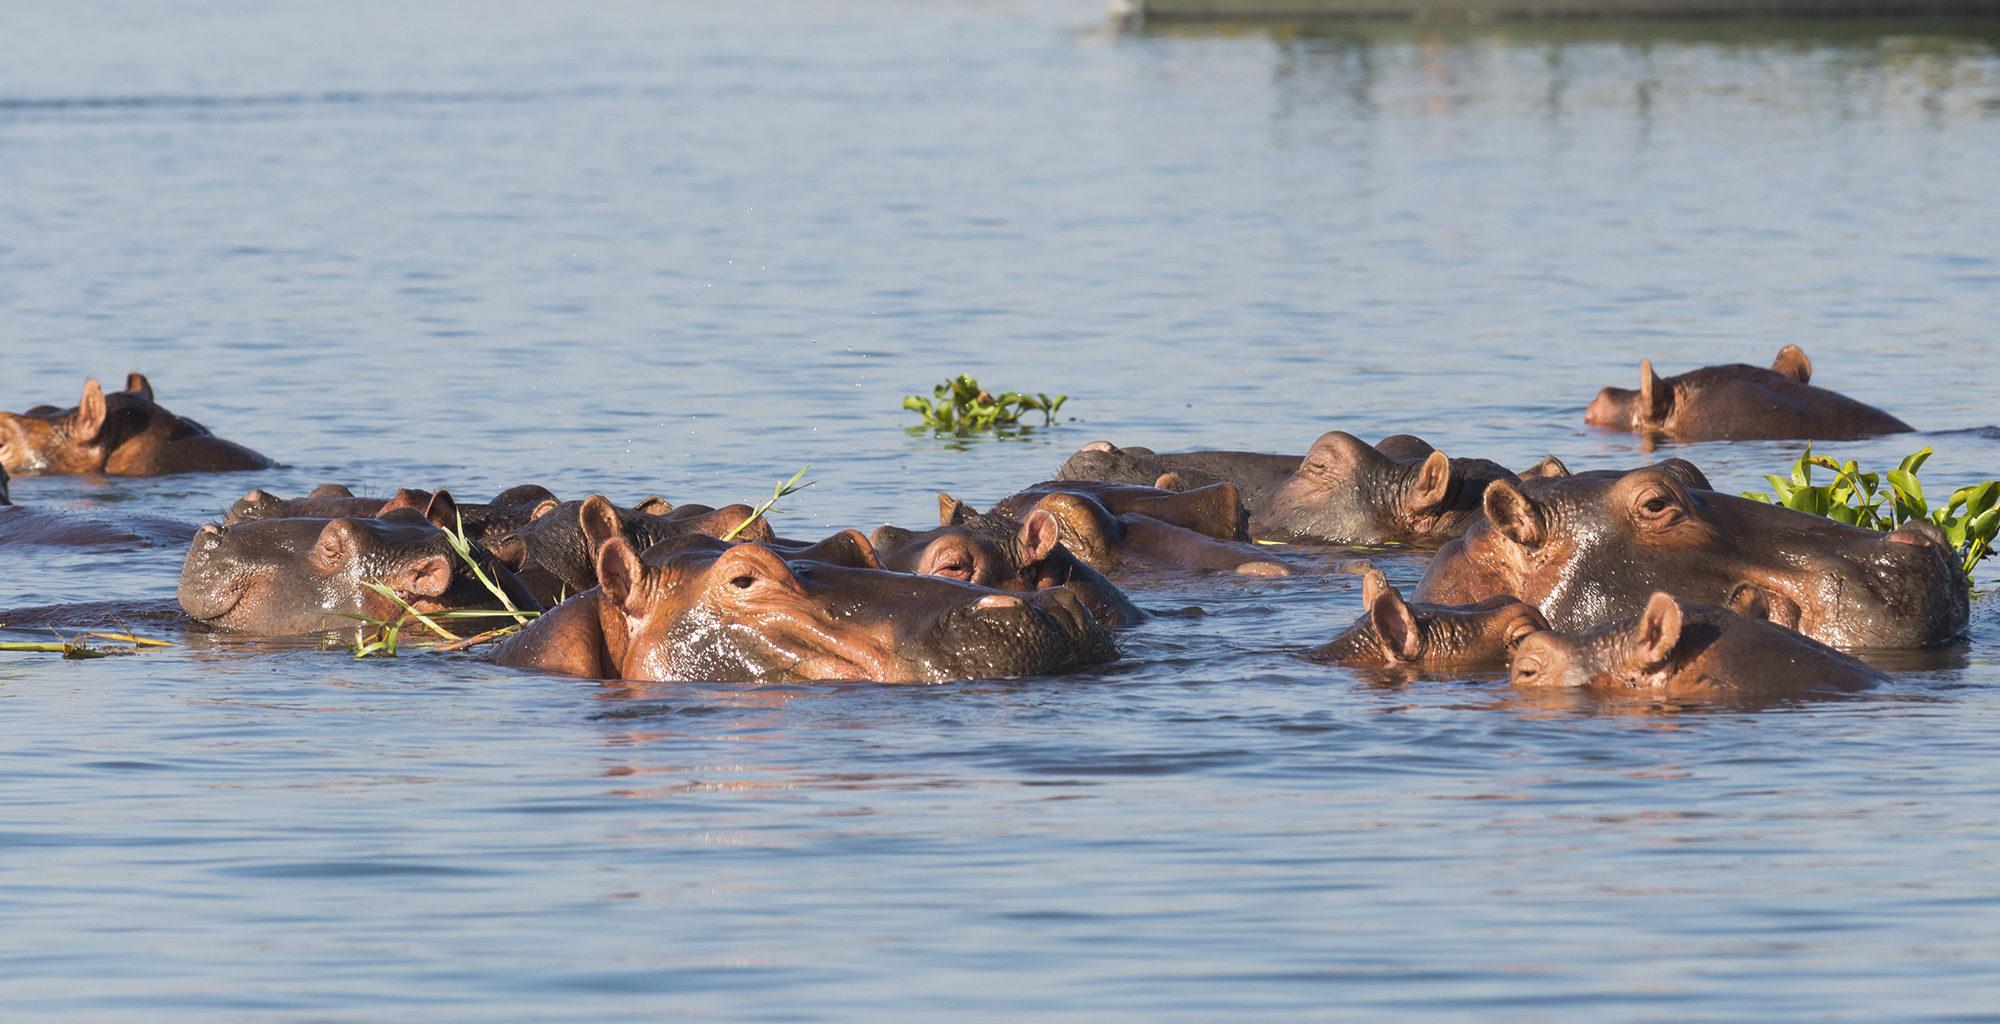 Malawi-Liwonde-National-Park-Wildlife-Hippo